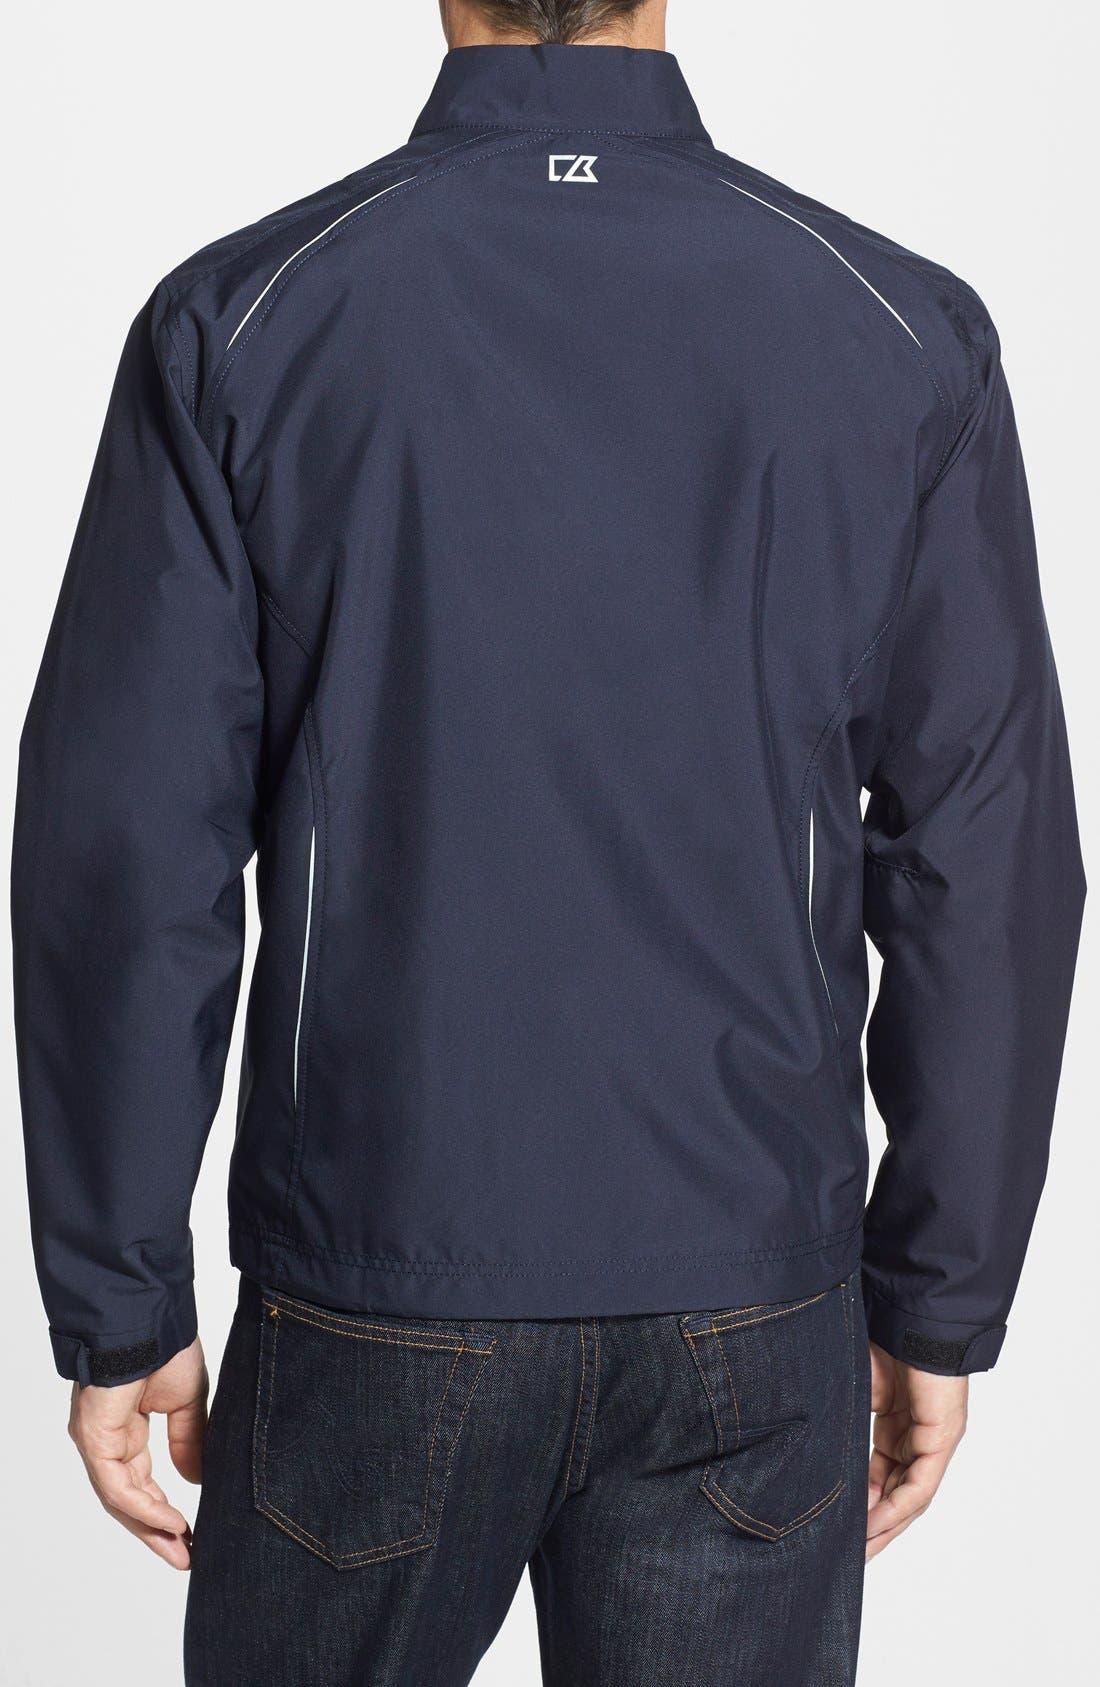 Denver Broncos - Beacon WeatherTec Wind & Water Resistant Jacket,                             Alternate thumbnail 2, color,                             Navy Blue